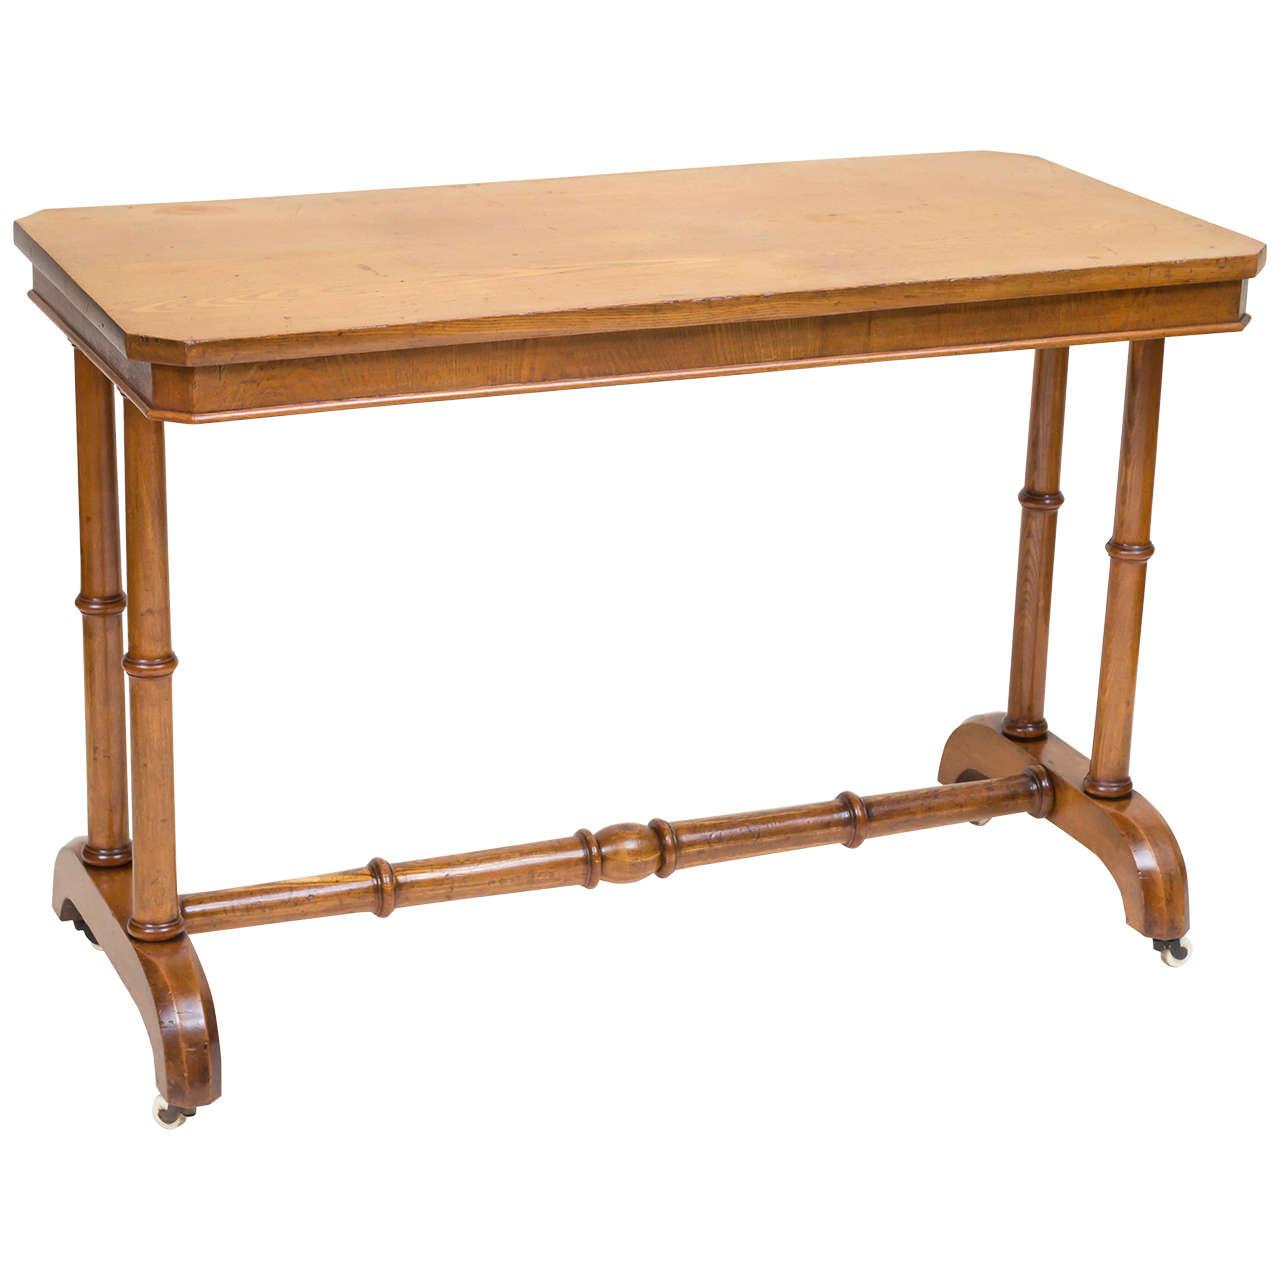 19th Century William IV Sofa or Writing Table